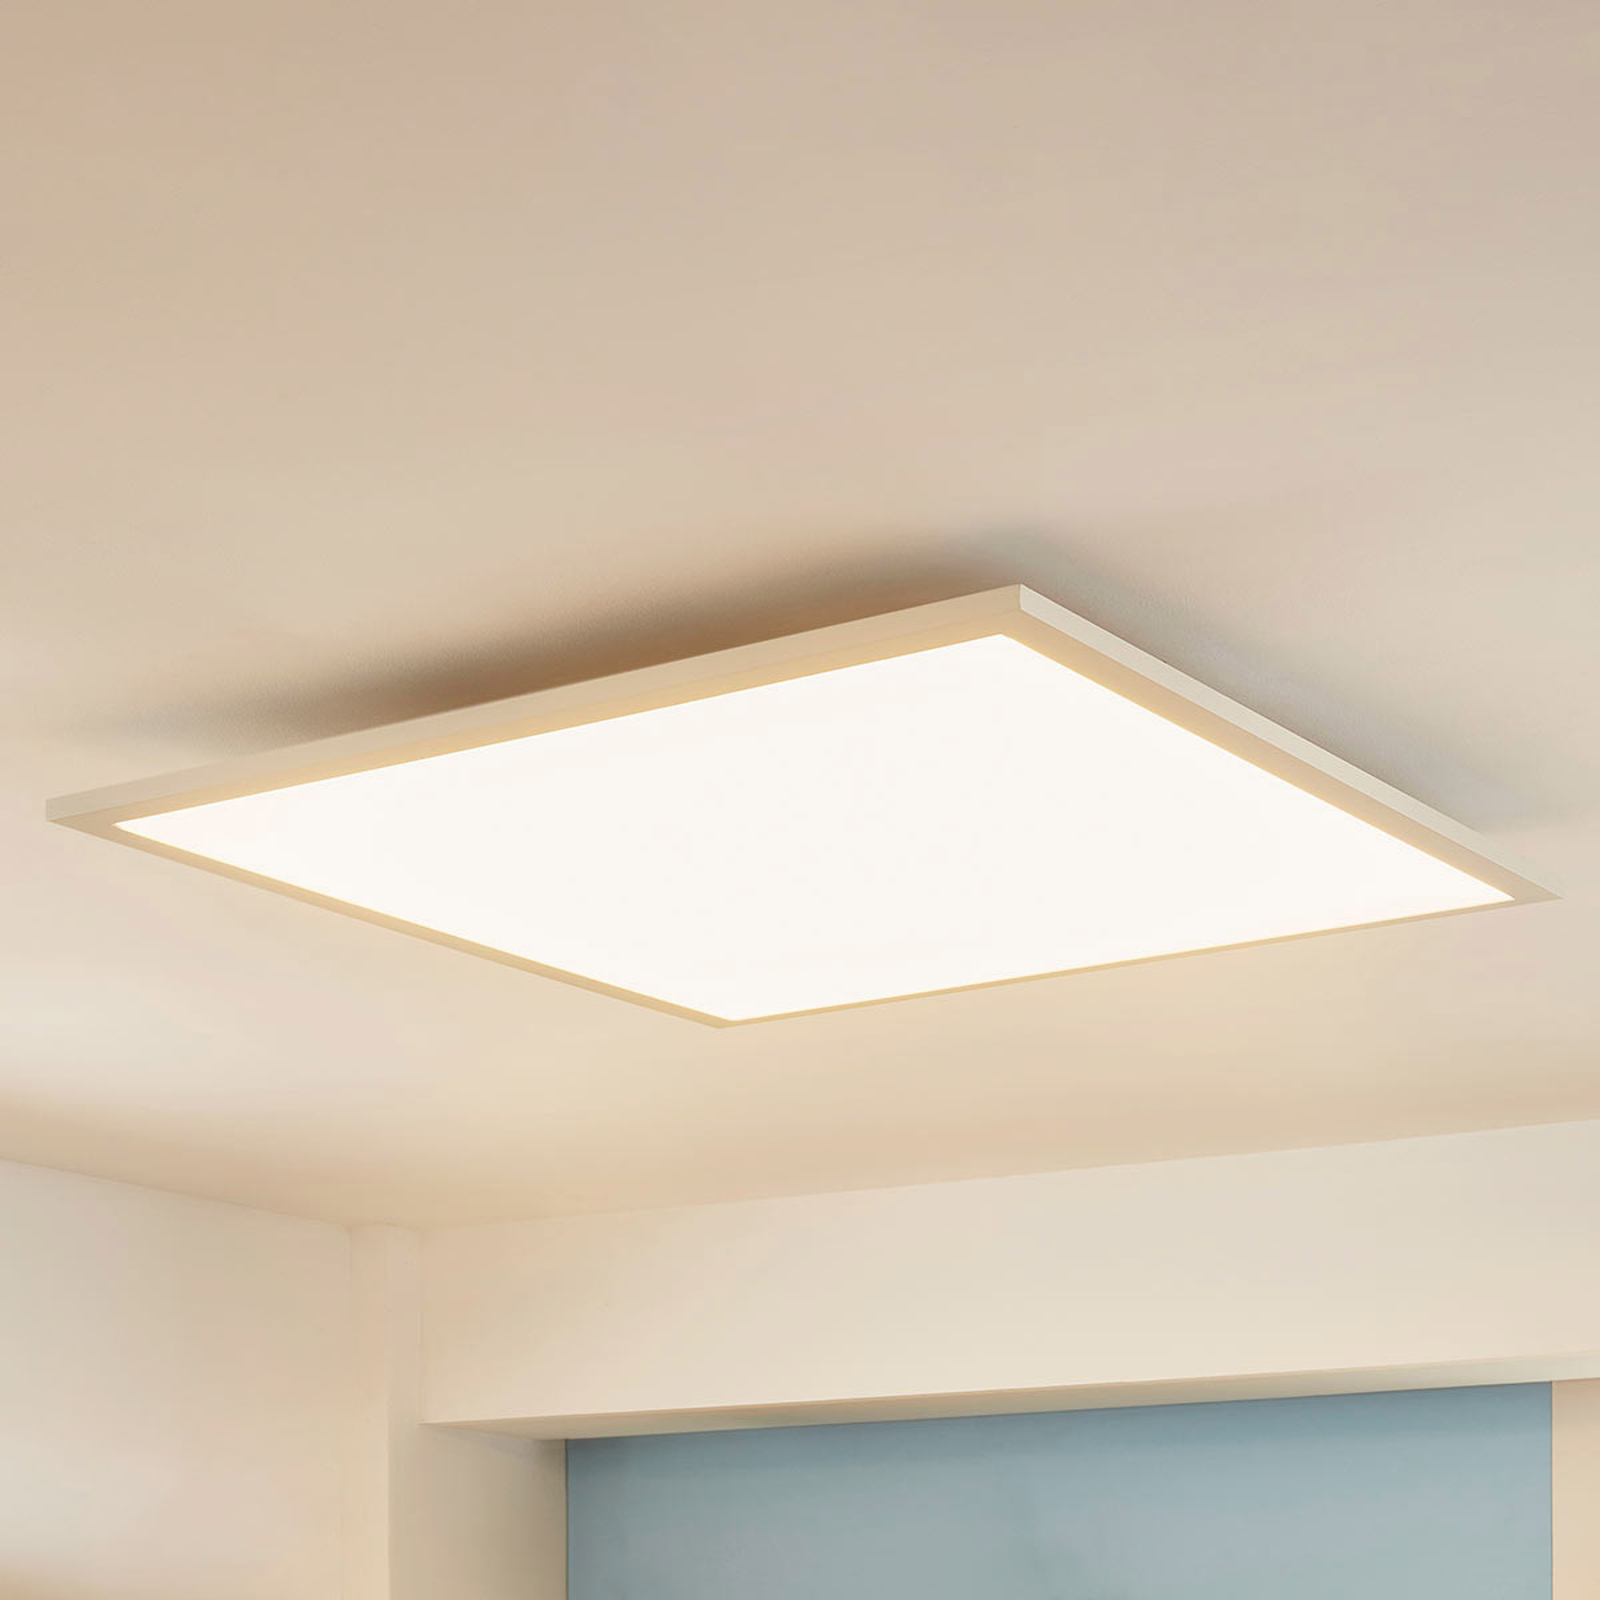 Pannello LED quadrato Enja, 62 x 62 cm